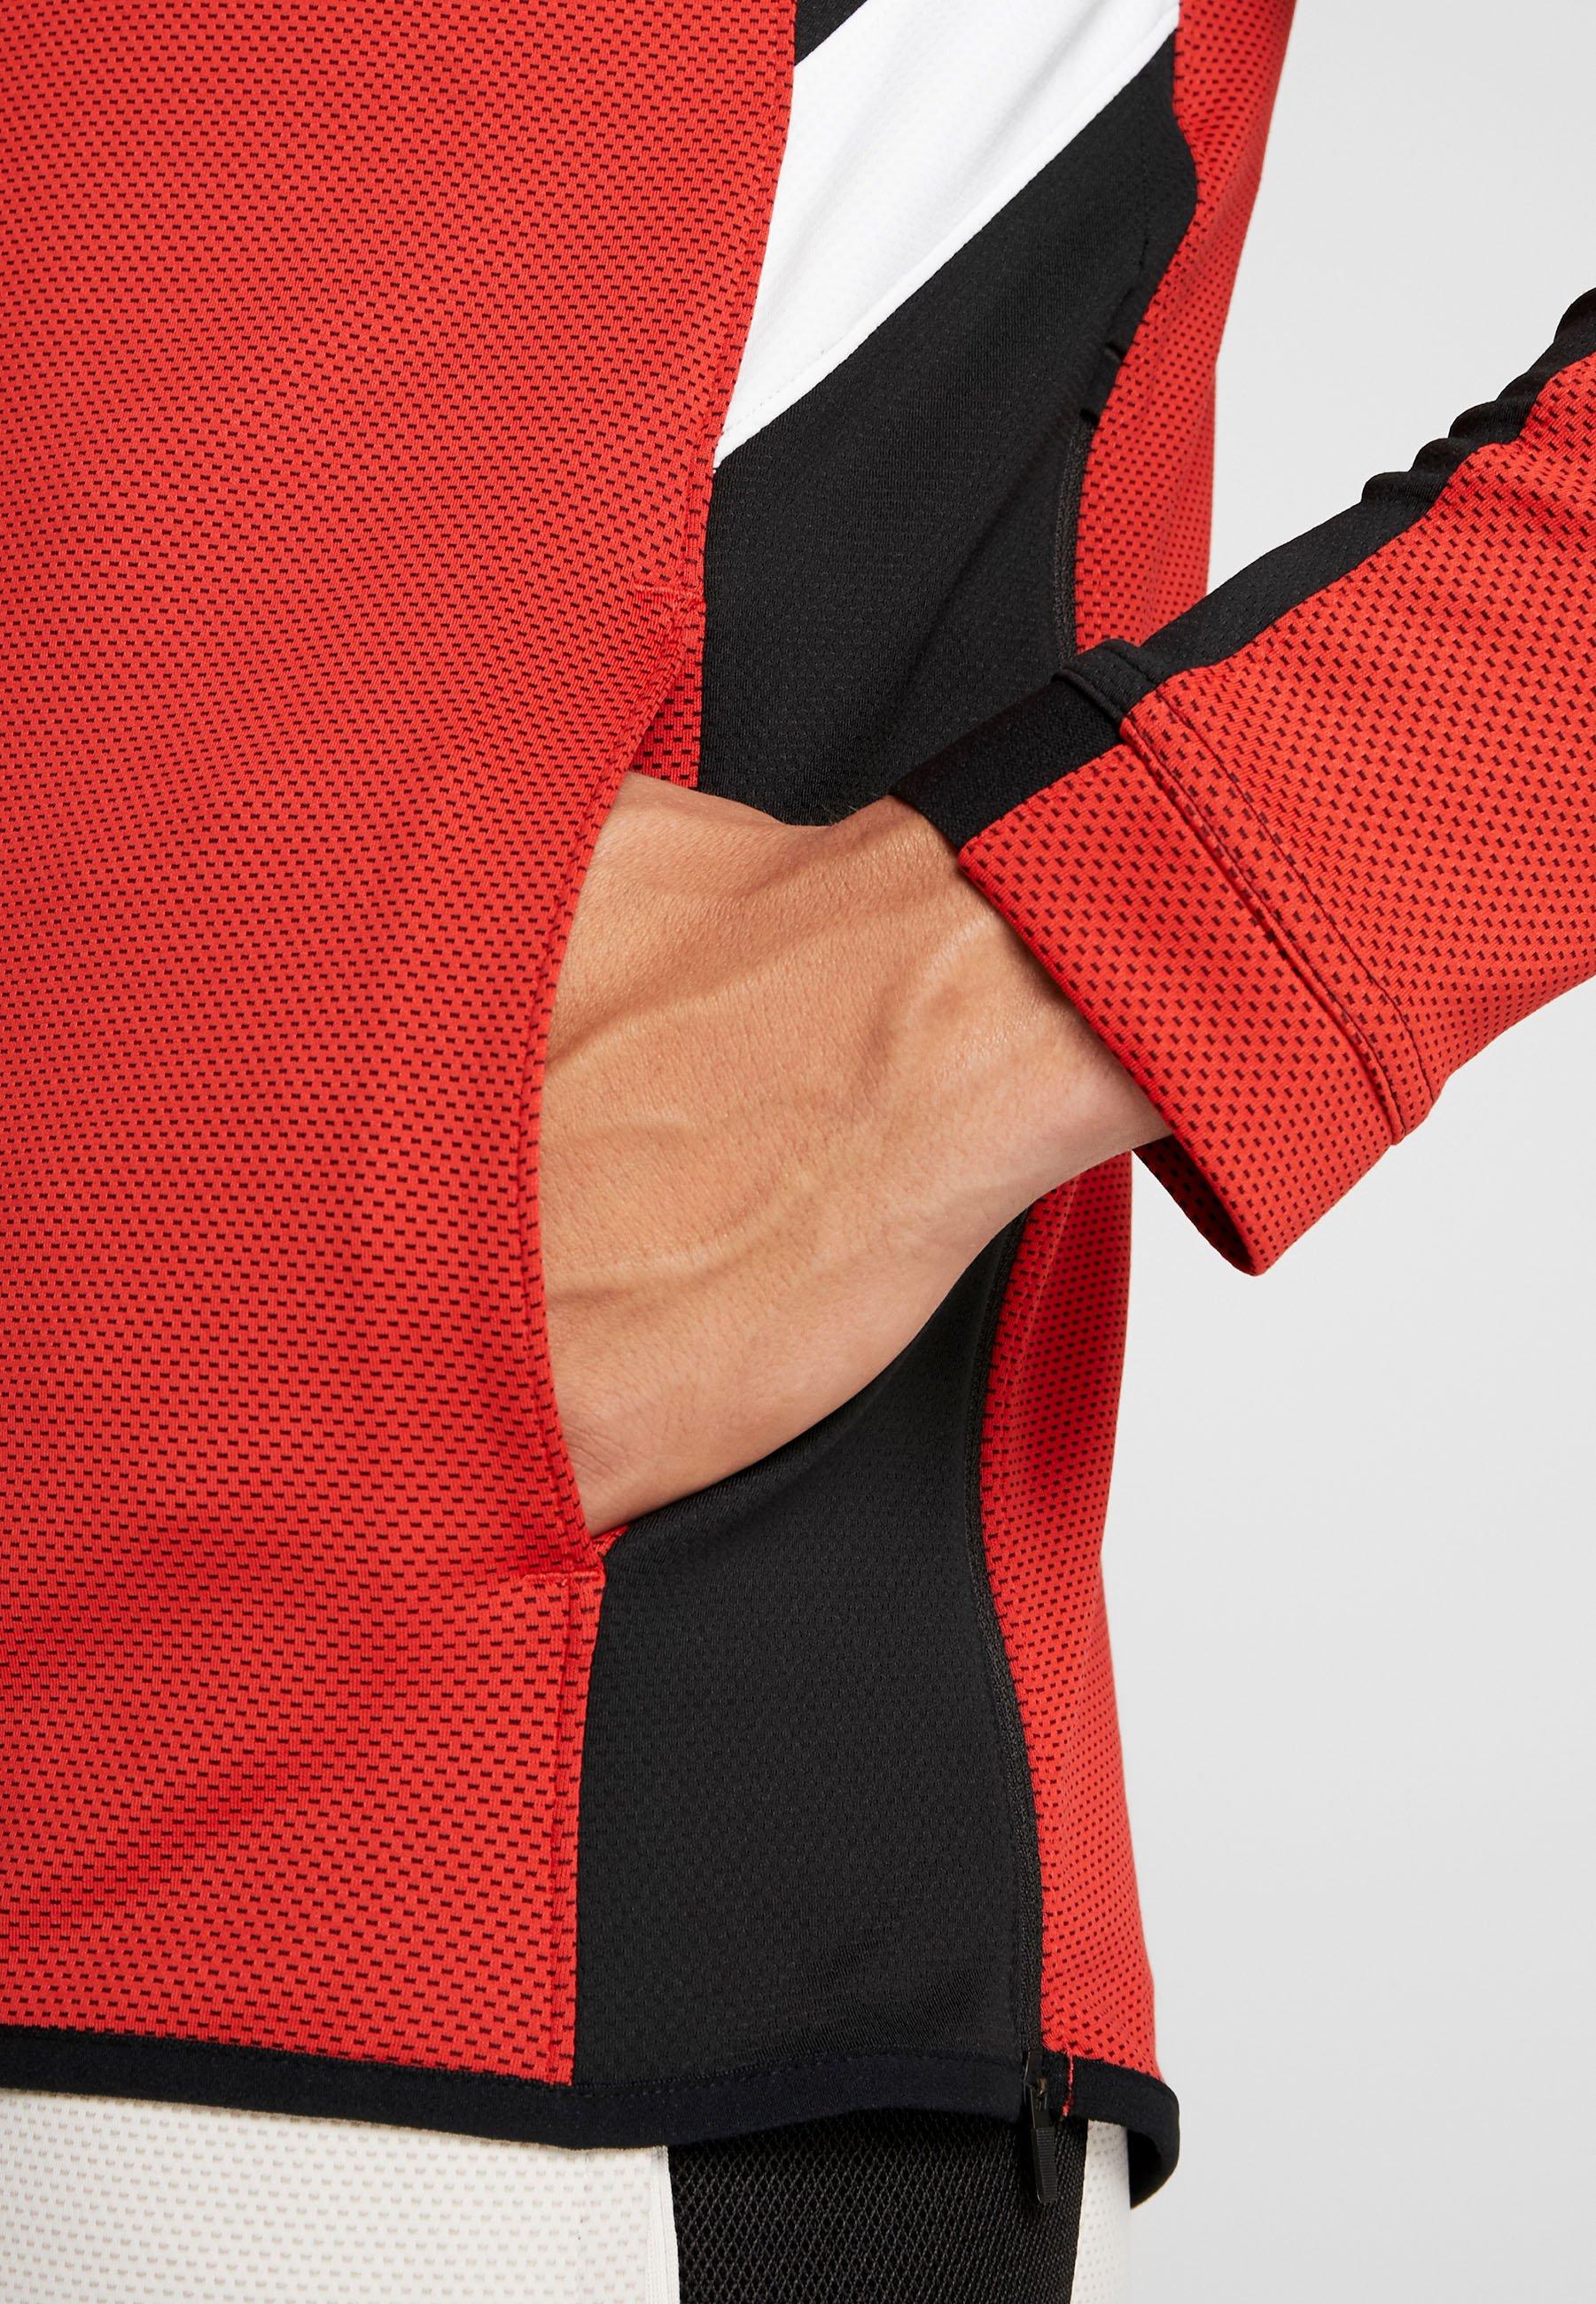 Houston Red Thermaflex black Nba Rockets Nike University De white Performance Survêtement Full ZipVeste 3Rq54jLAc